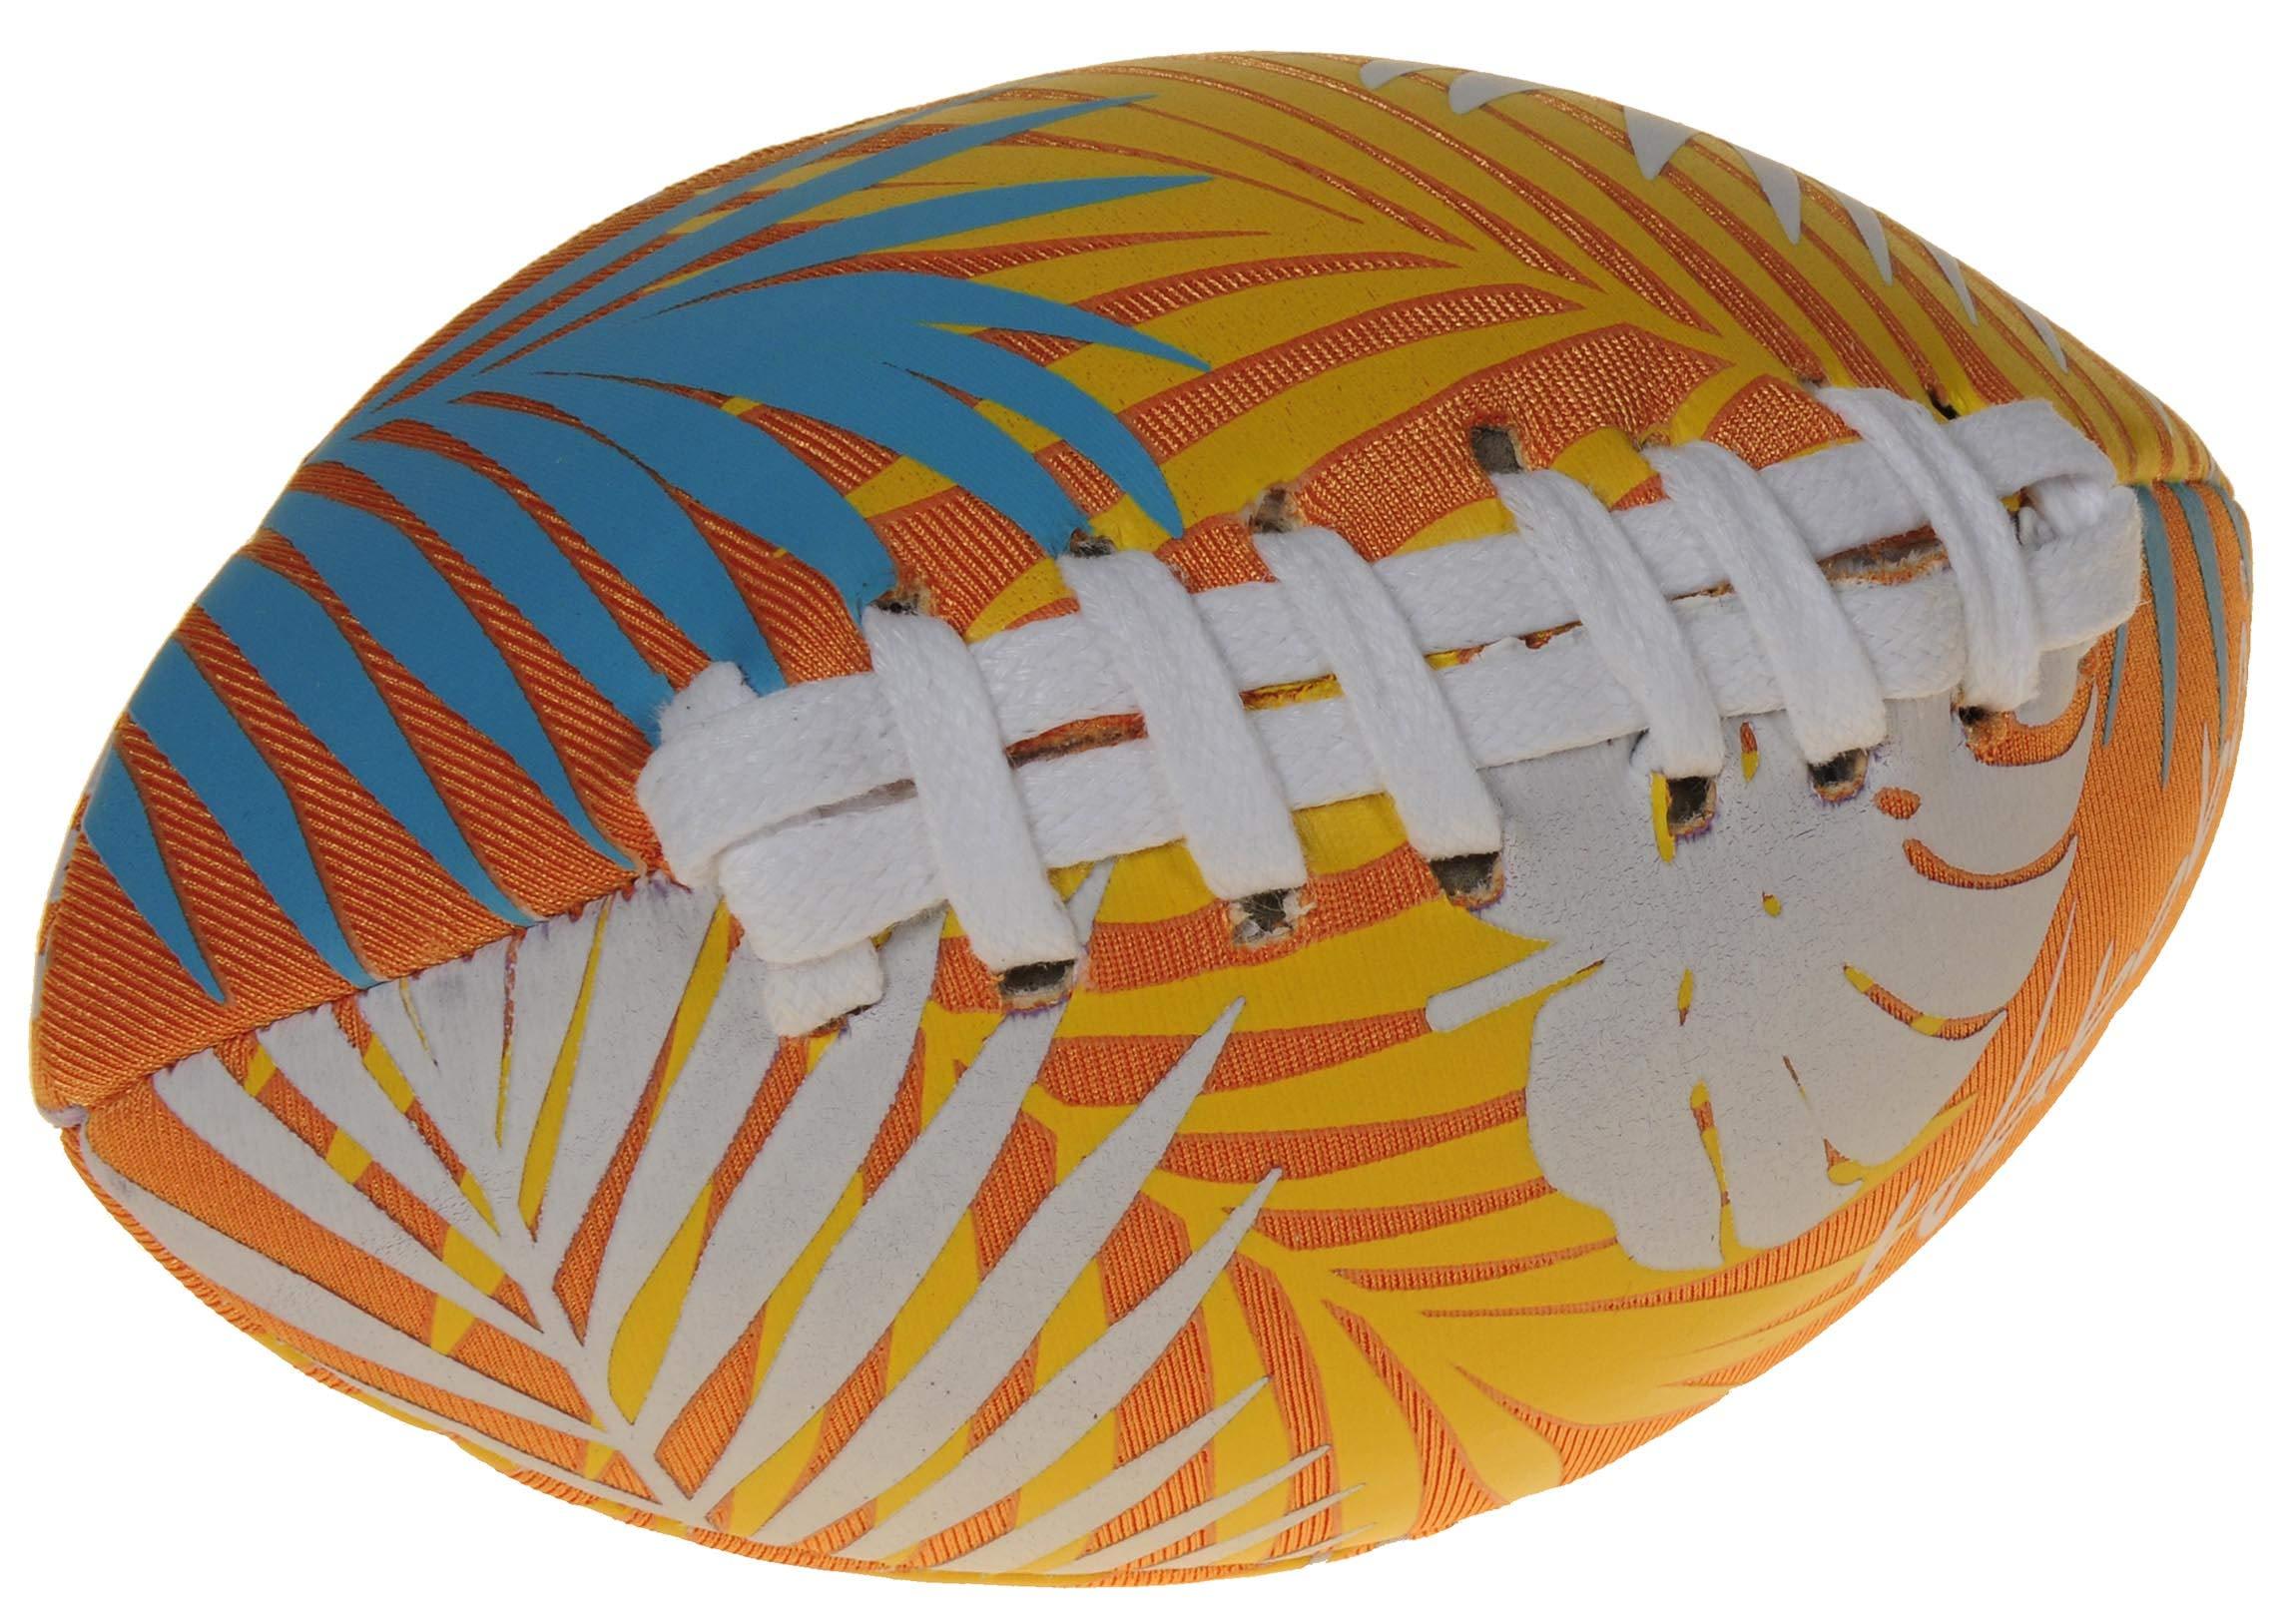 Waboba Color Changing Water Football 6'' // Bundle of 2 Footballs (Random Colors) // Bonus Blue Nylon Mesh Carry Bag// Bundled Items by Waboba (Image #2)